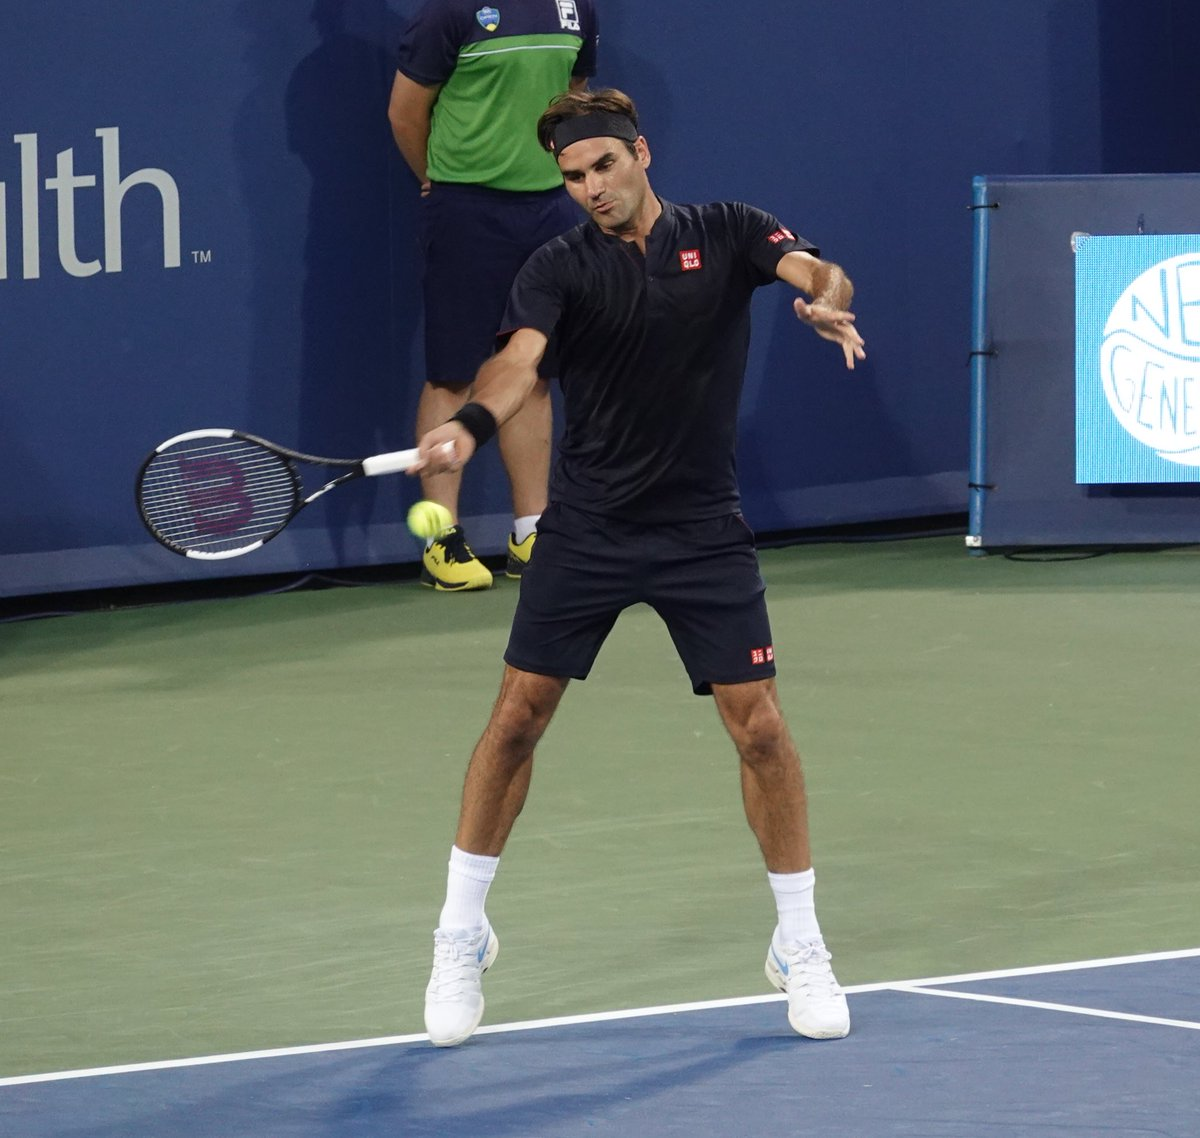 Roger Federer first match at @CincyTennis 2018 part 4<br>http://pic.twitter.com/lsWO2dUDOQ